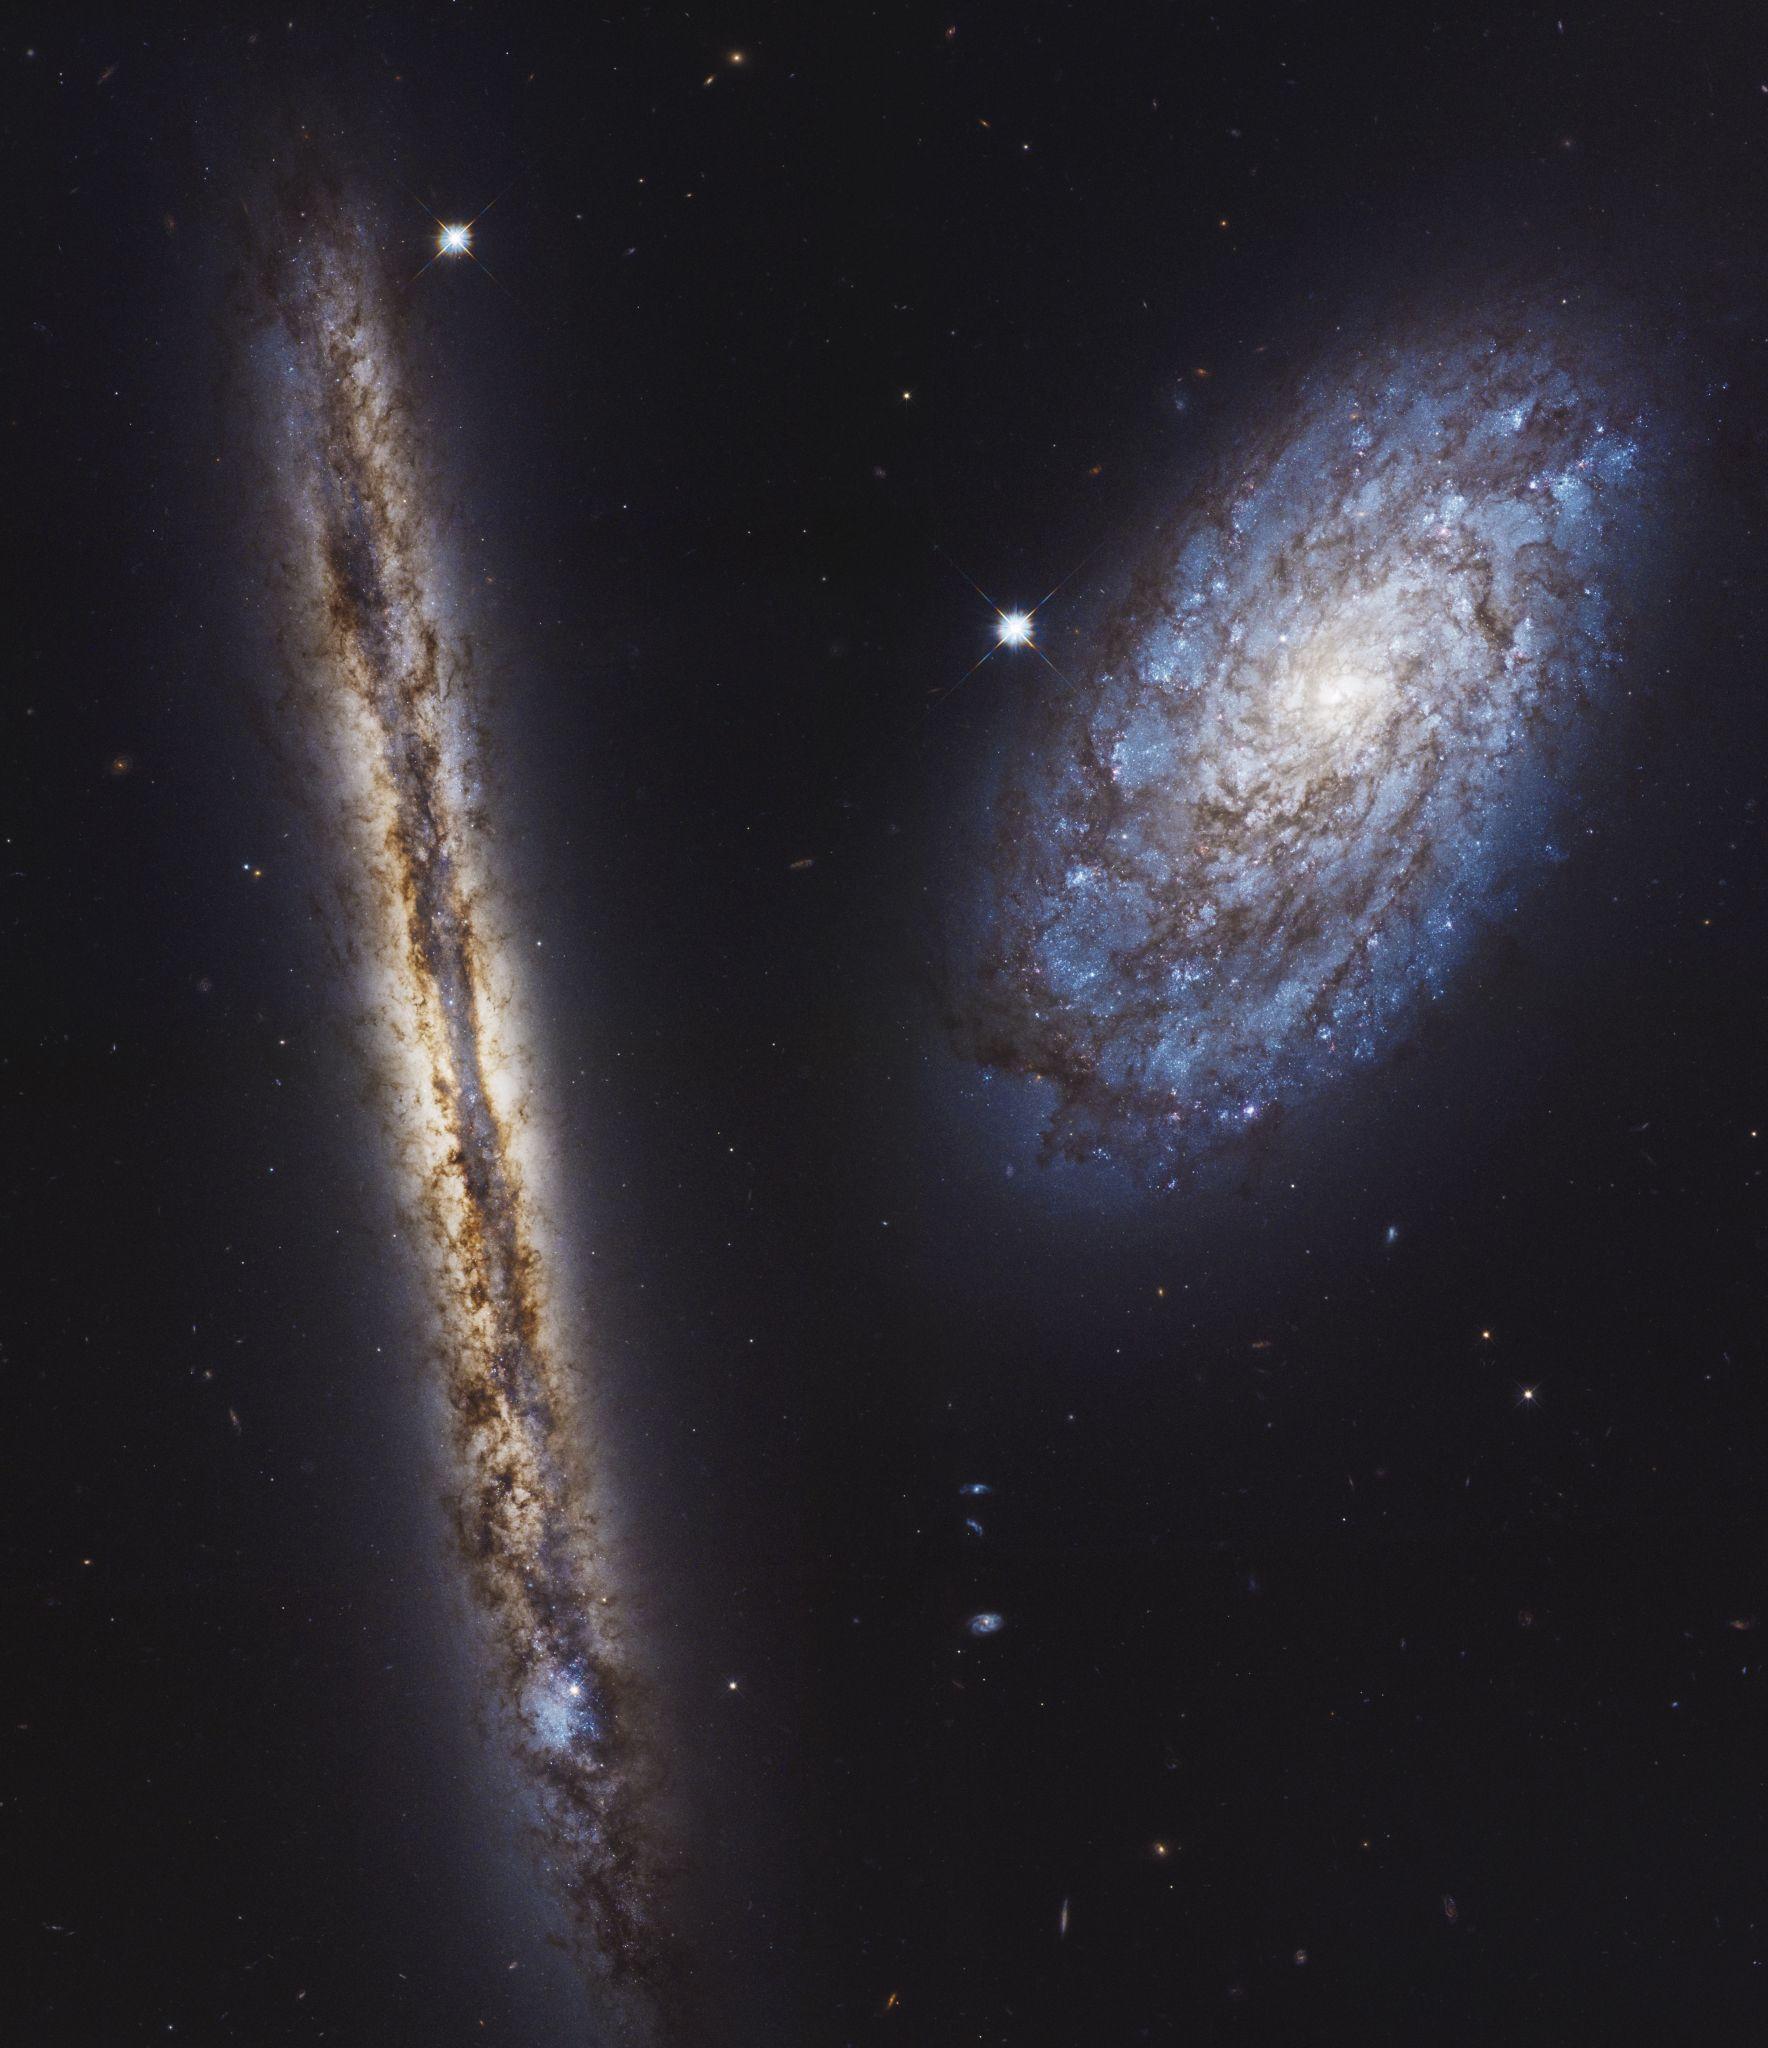 Hubble's most galactically-amazing photo yet